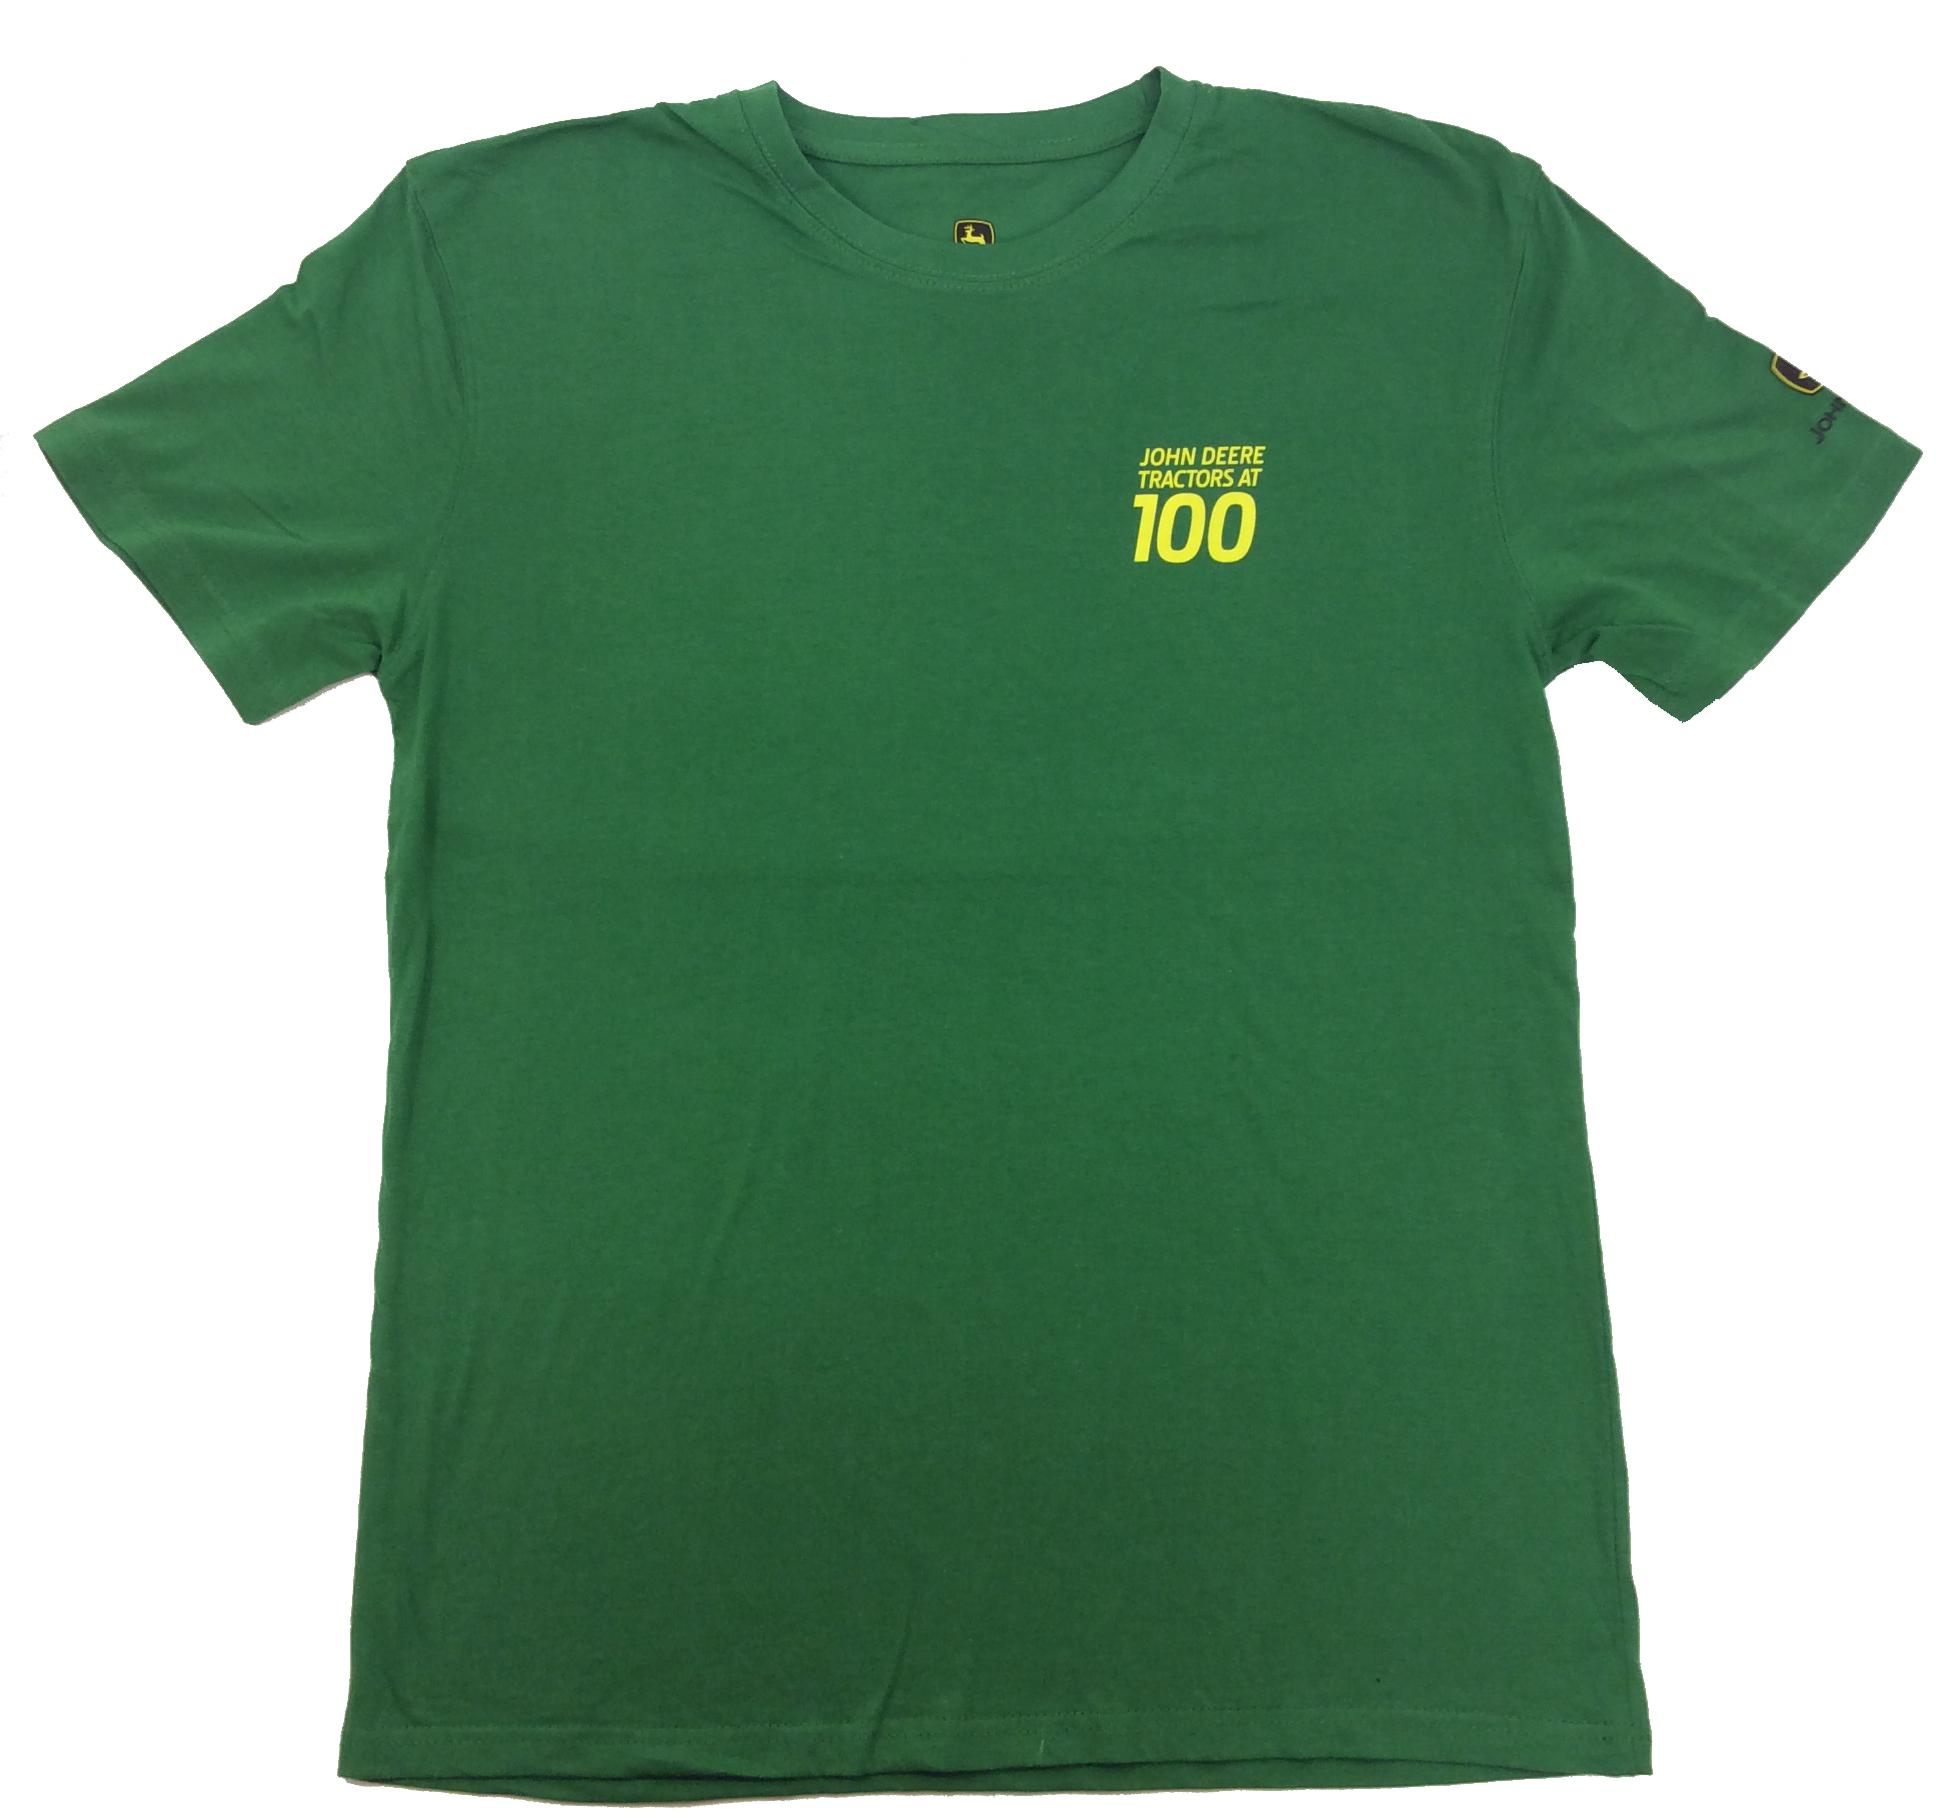 62ee55eb765 John Deere Limited Edition 100th Anniversary The Legend Runs On T-shirt -  Trenz Shirt Company